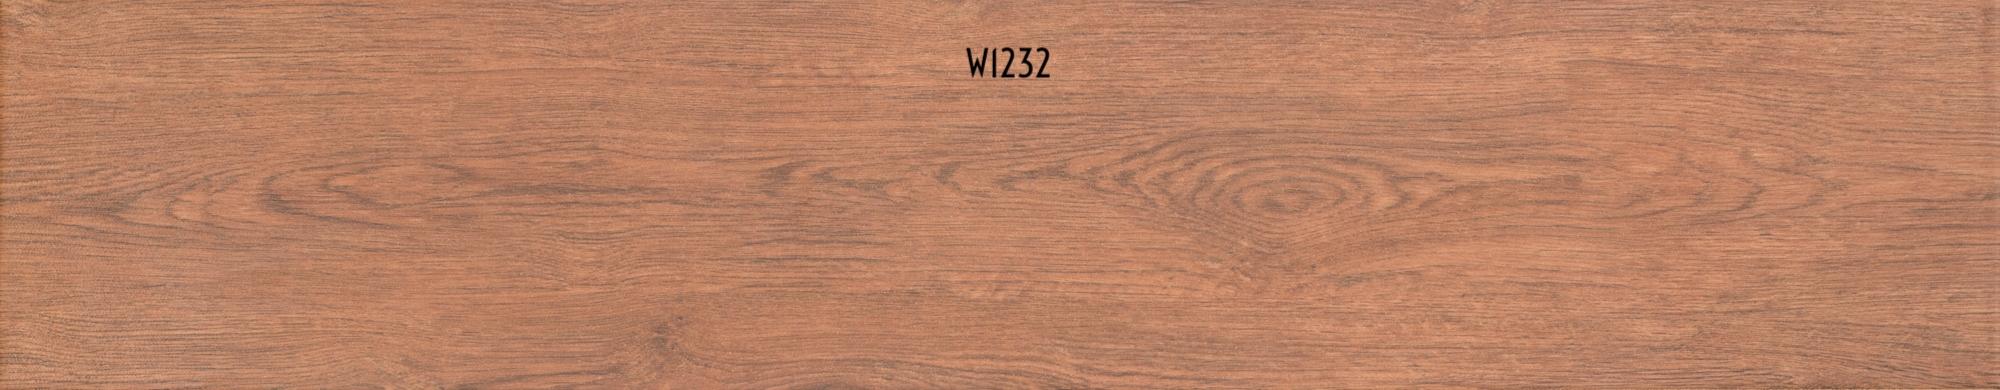 W1232